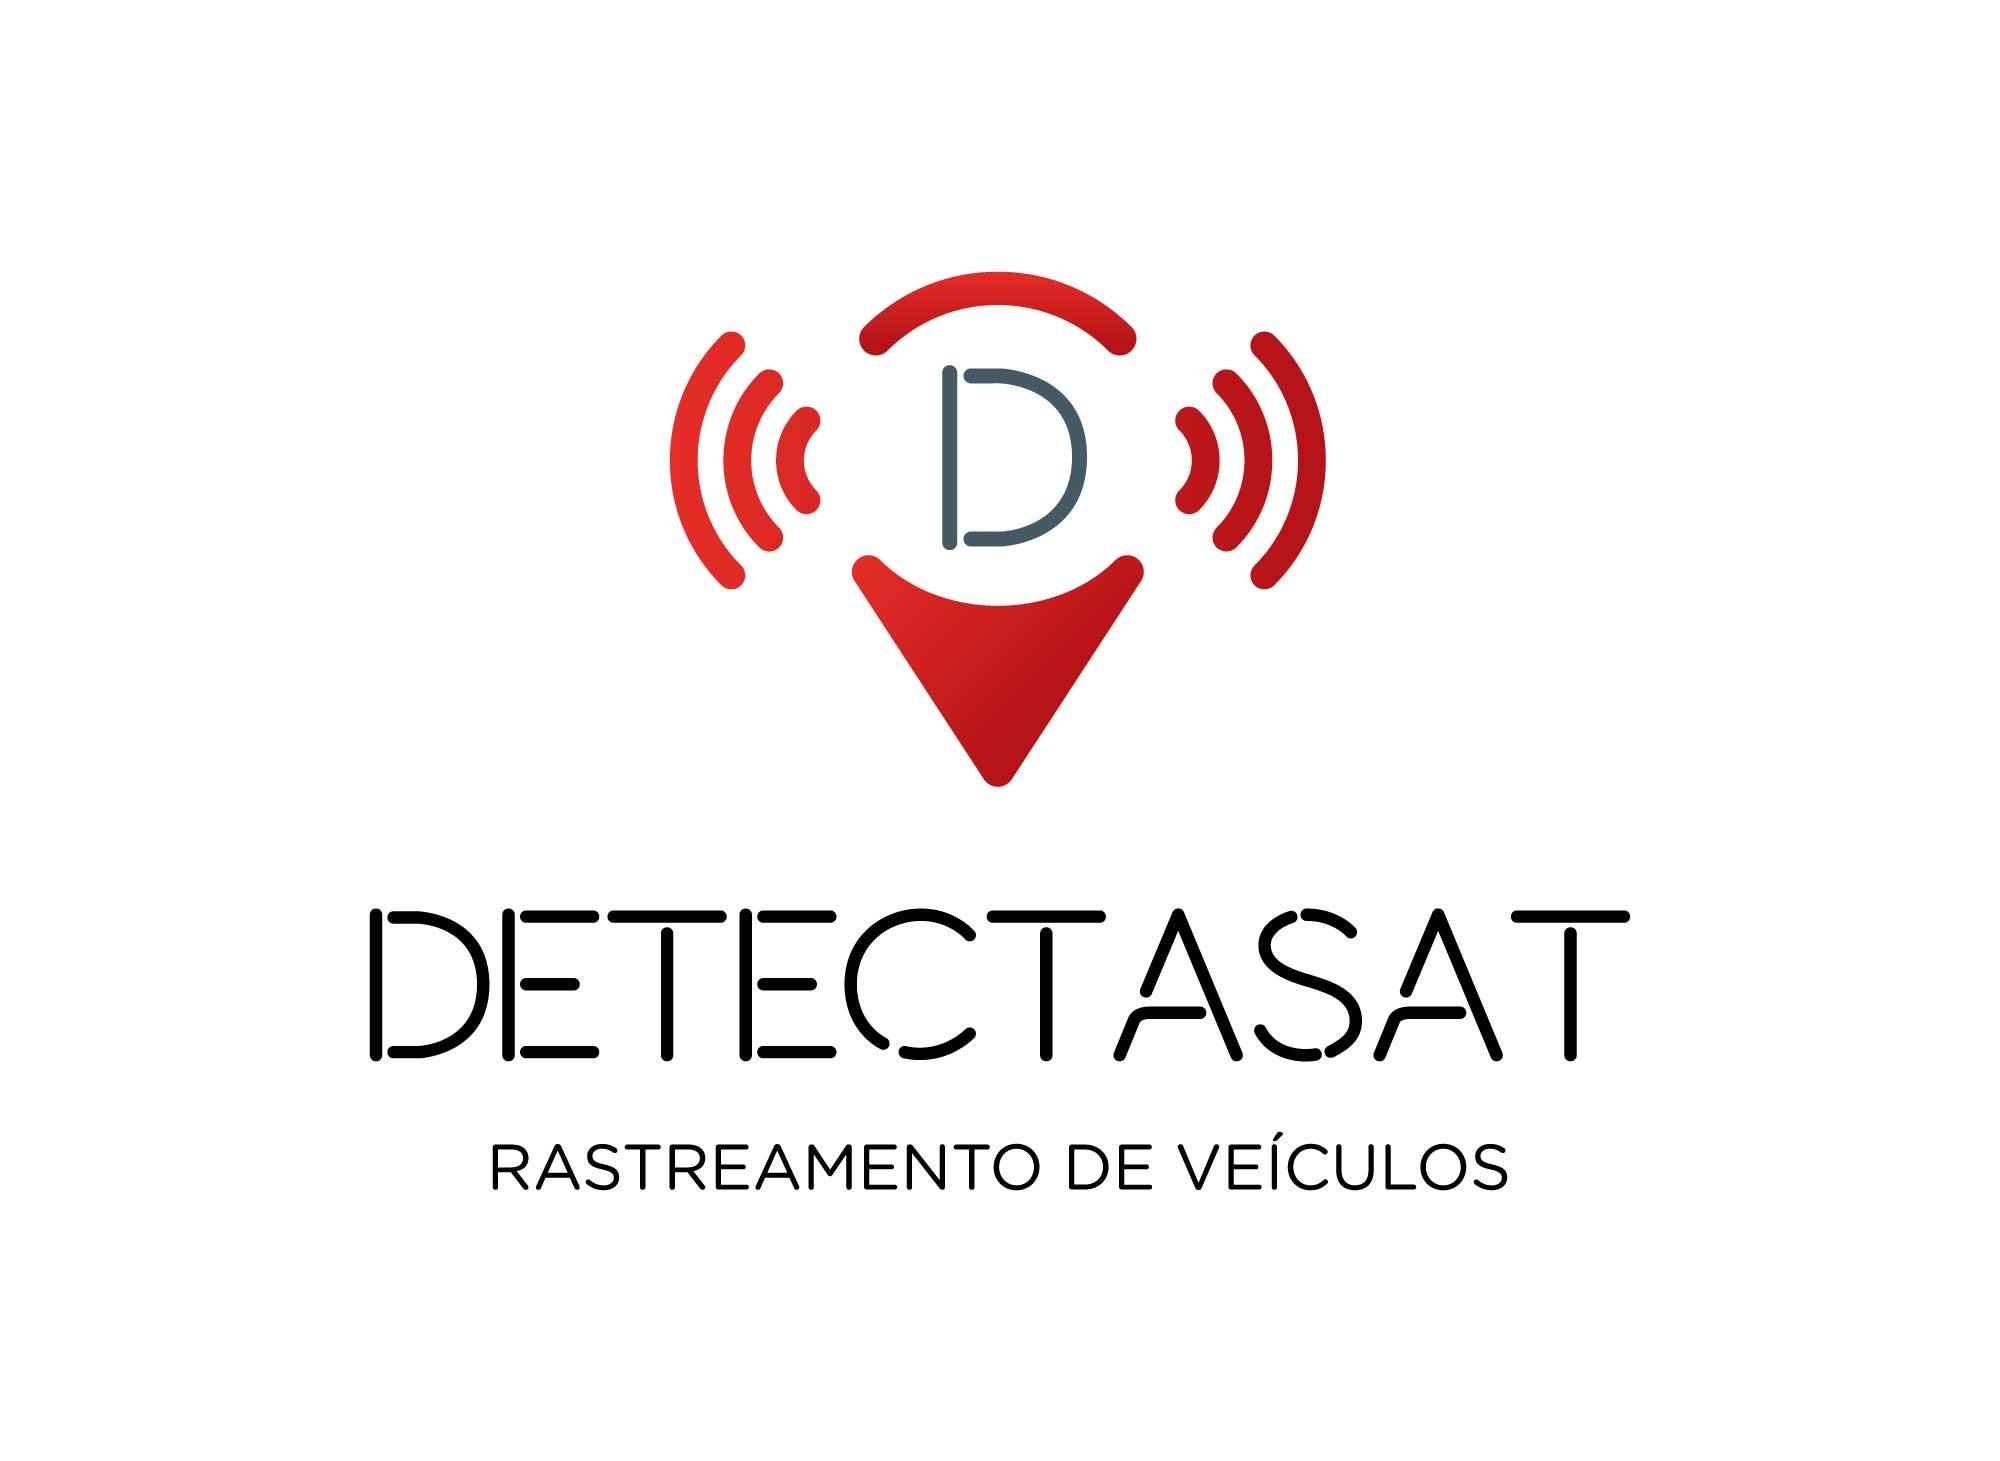 detectasat-rastreamento-veicular-cliente-agencia-diretriz-digital-marketing-fortaleza